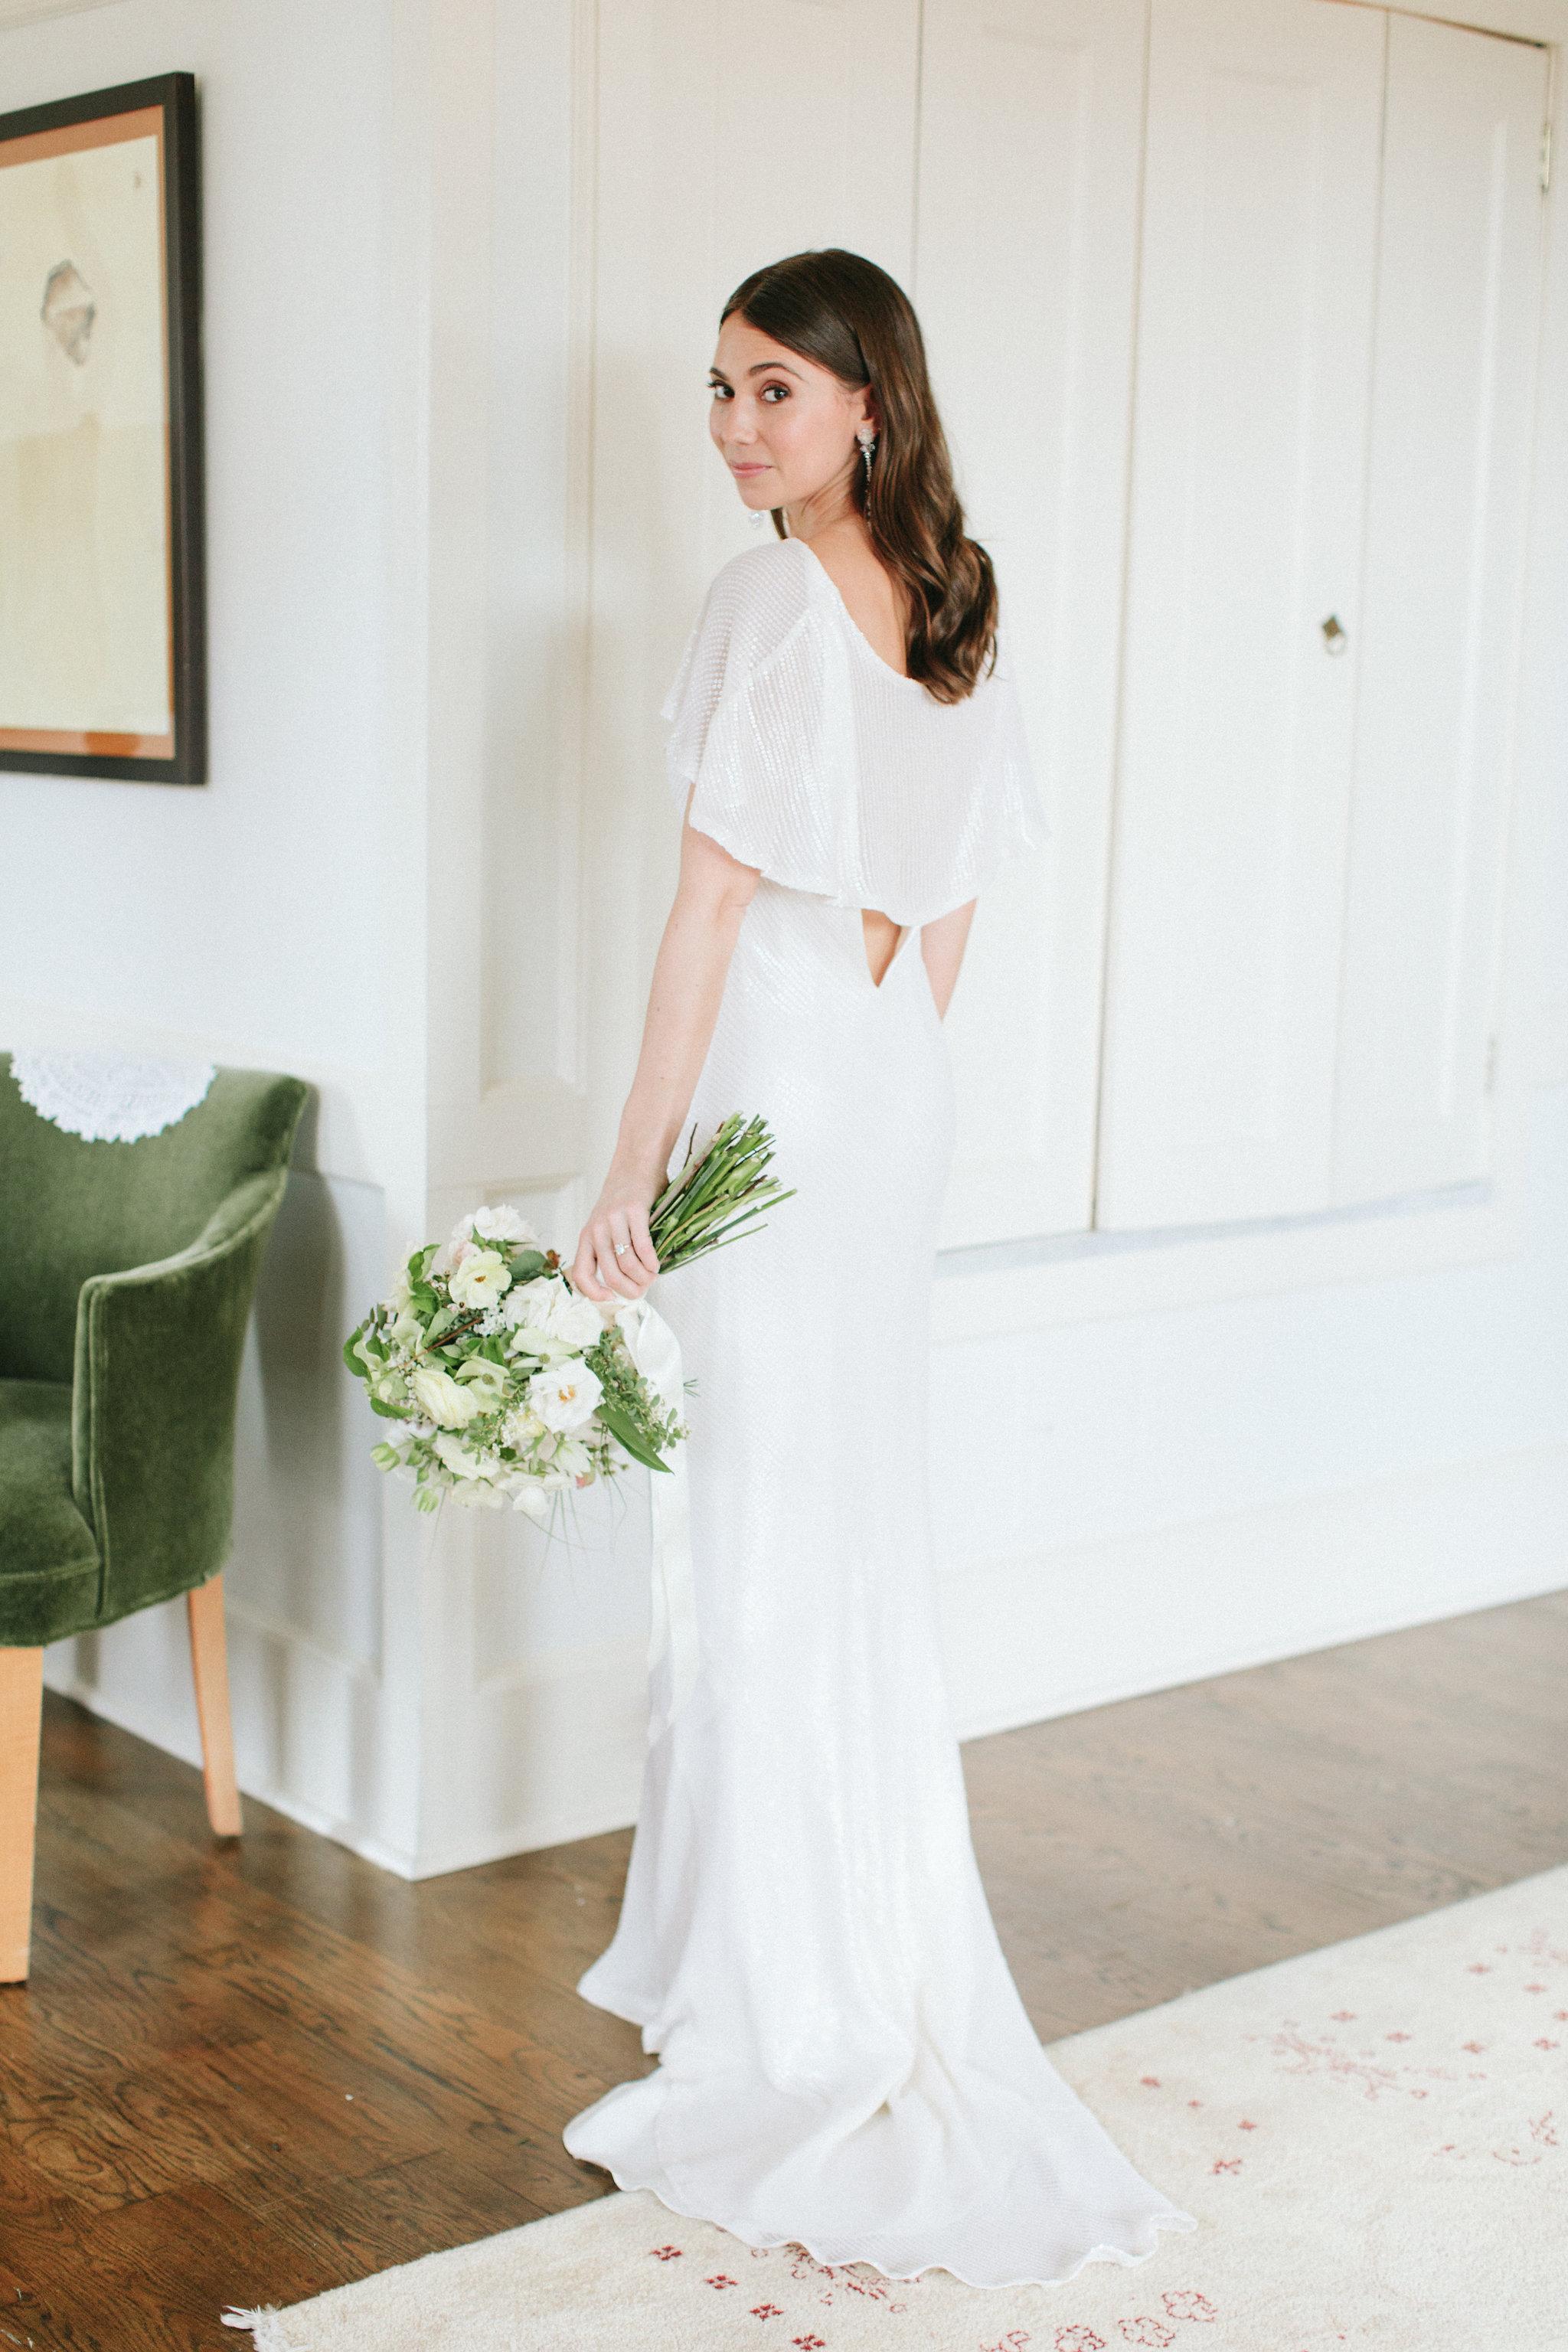 bowery-hotel-wedding-jove-meyer-events-018.jpg